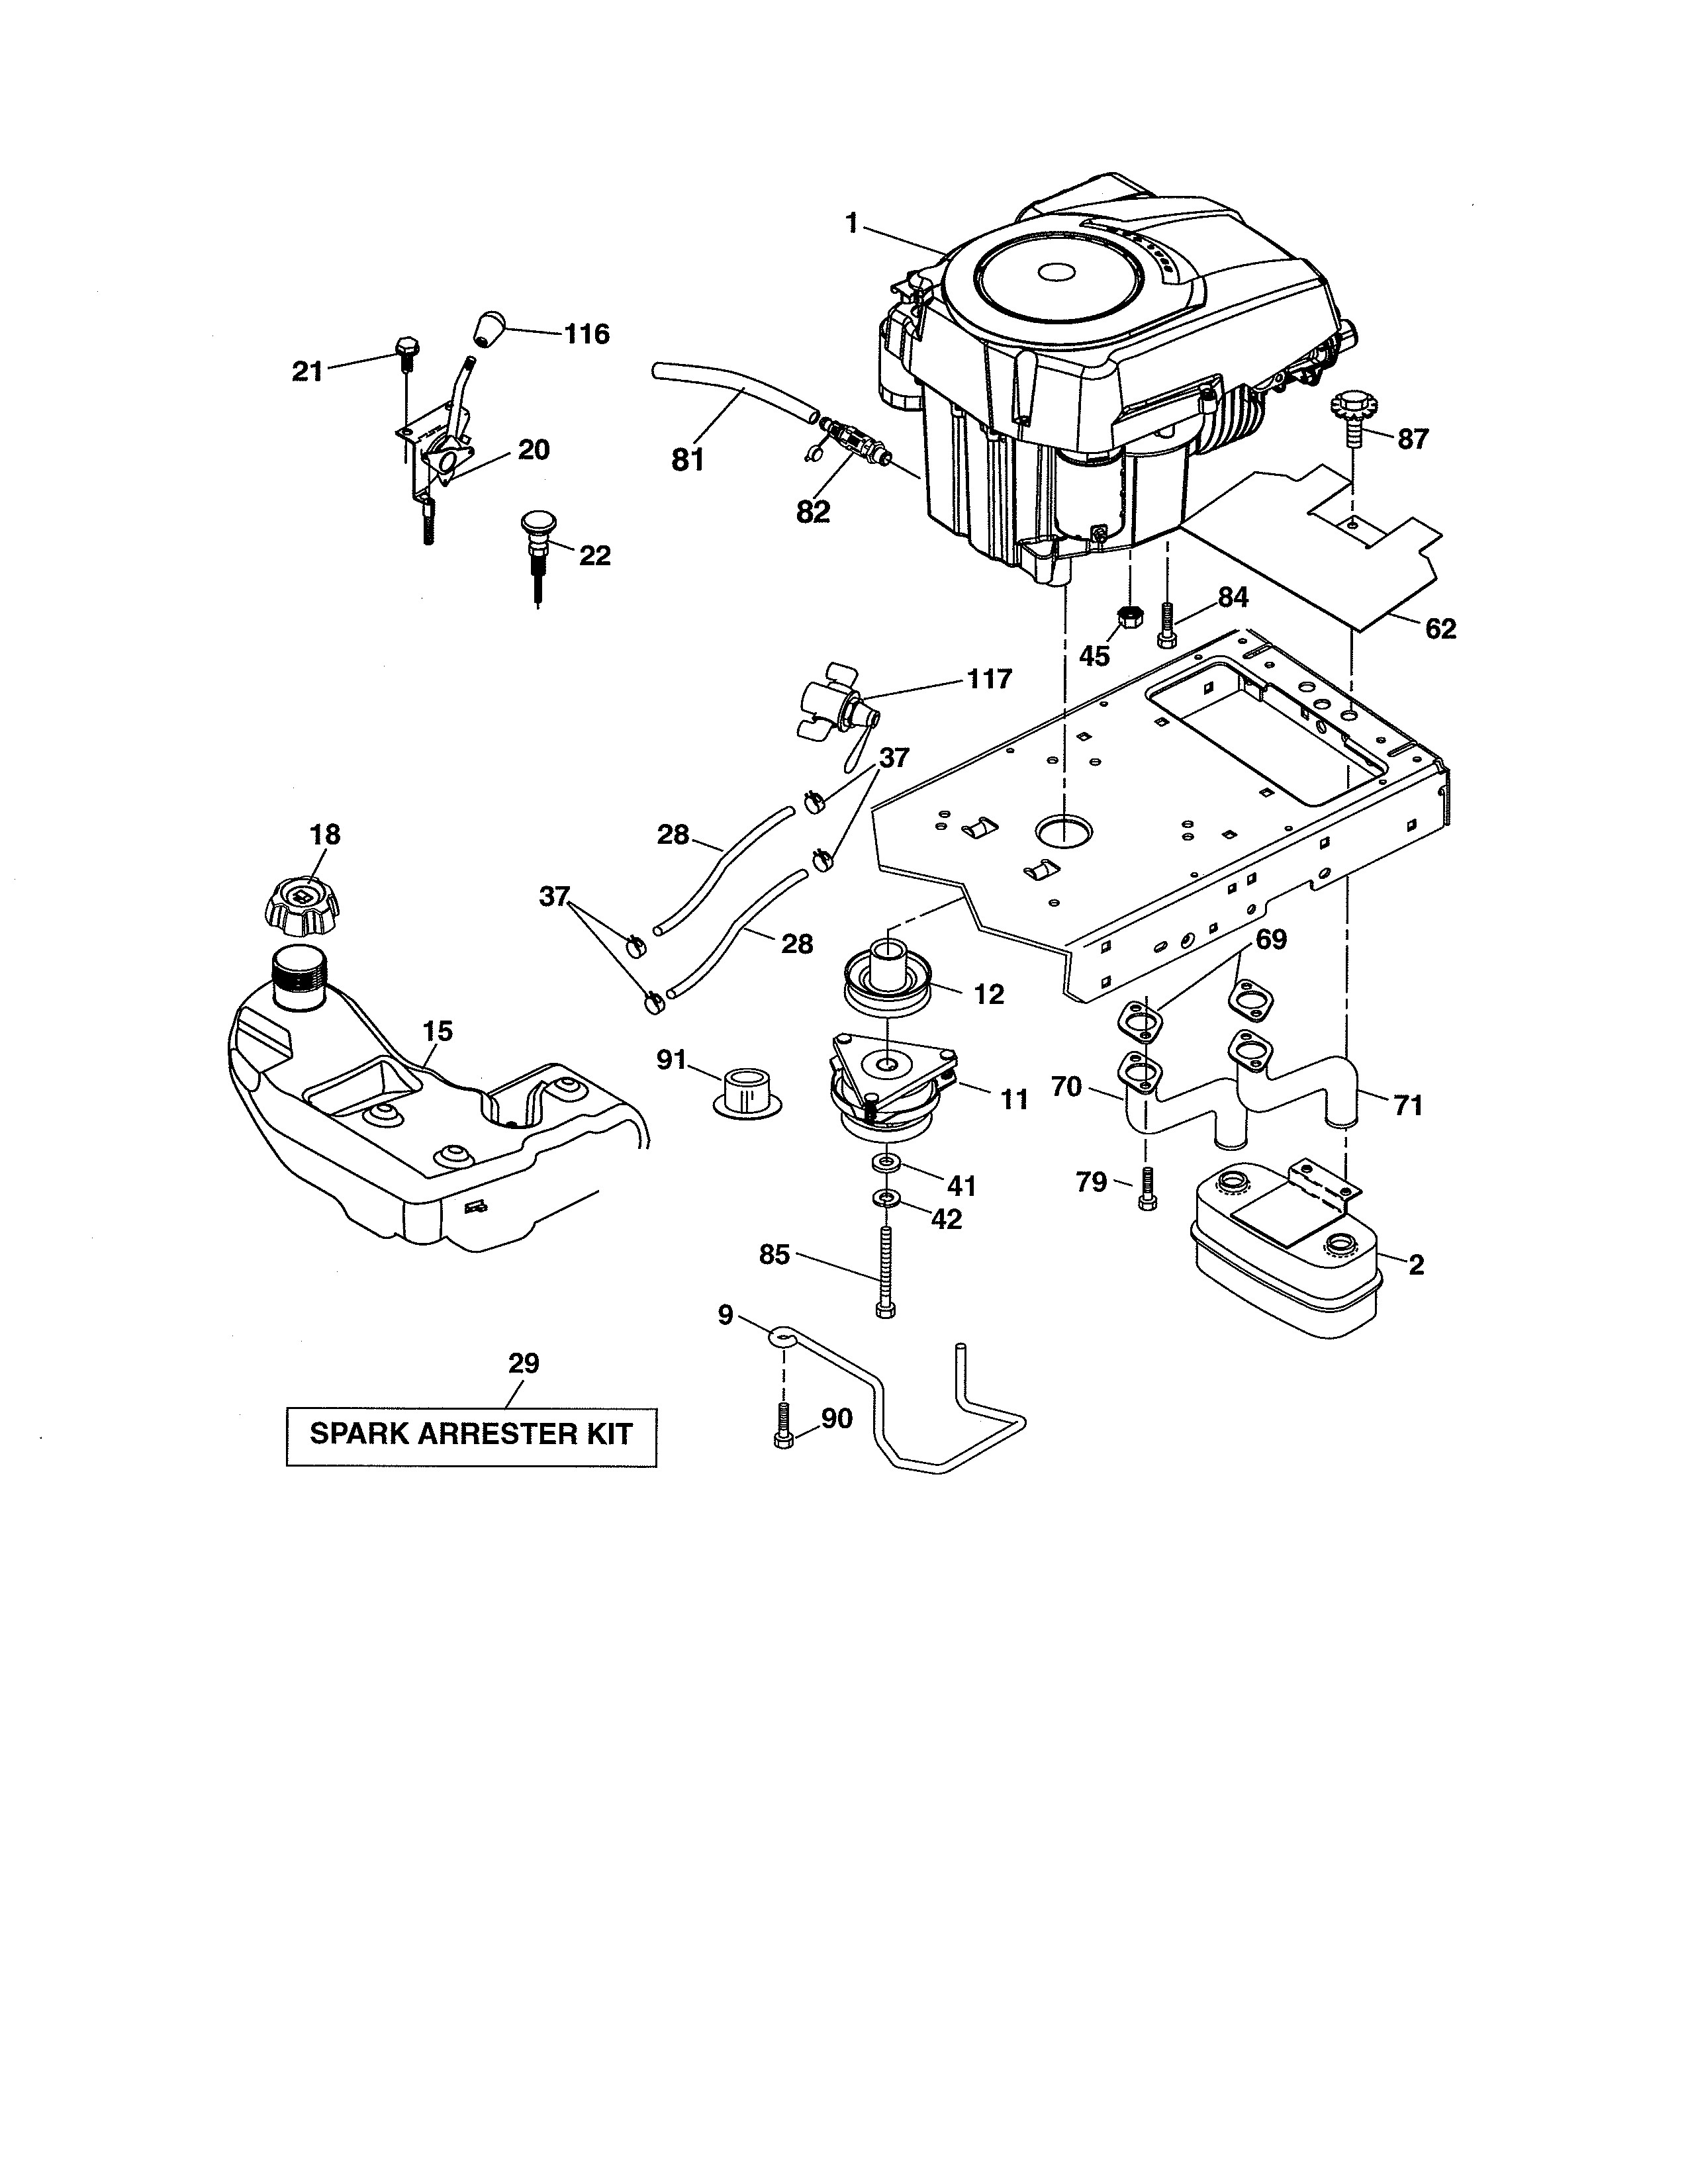 Craftsman Riding Mower Parts Diagram Craftsman Model Lawn Tractor Genuine Parts Of Craftsman Riding Mower Parts Diagram